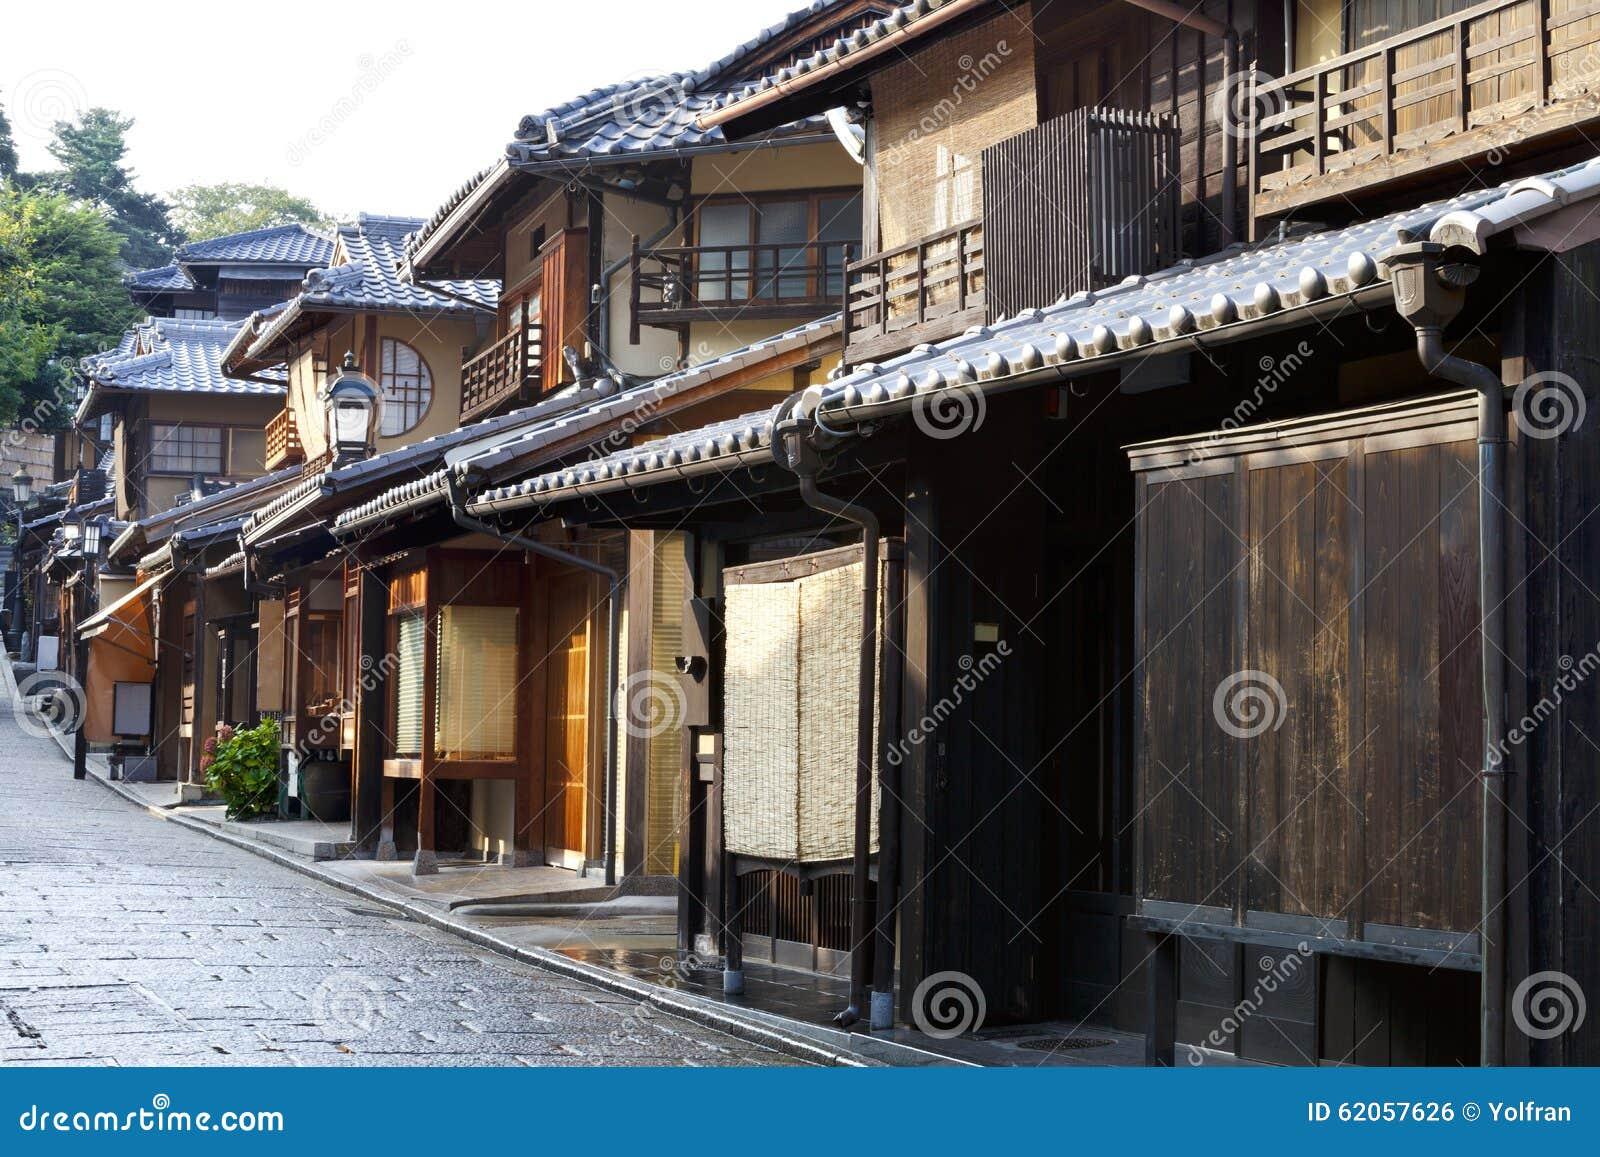 Japanische holzh user auf kyoto stra e stockfoto bild for Case in giappone